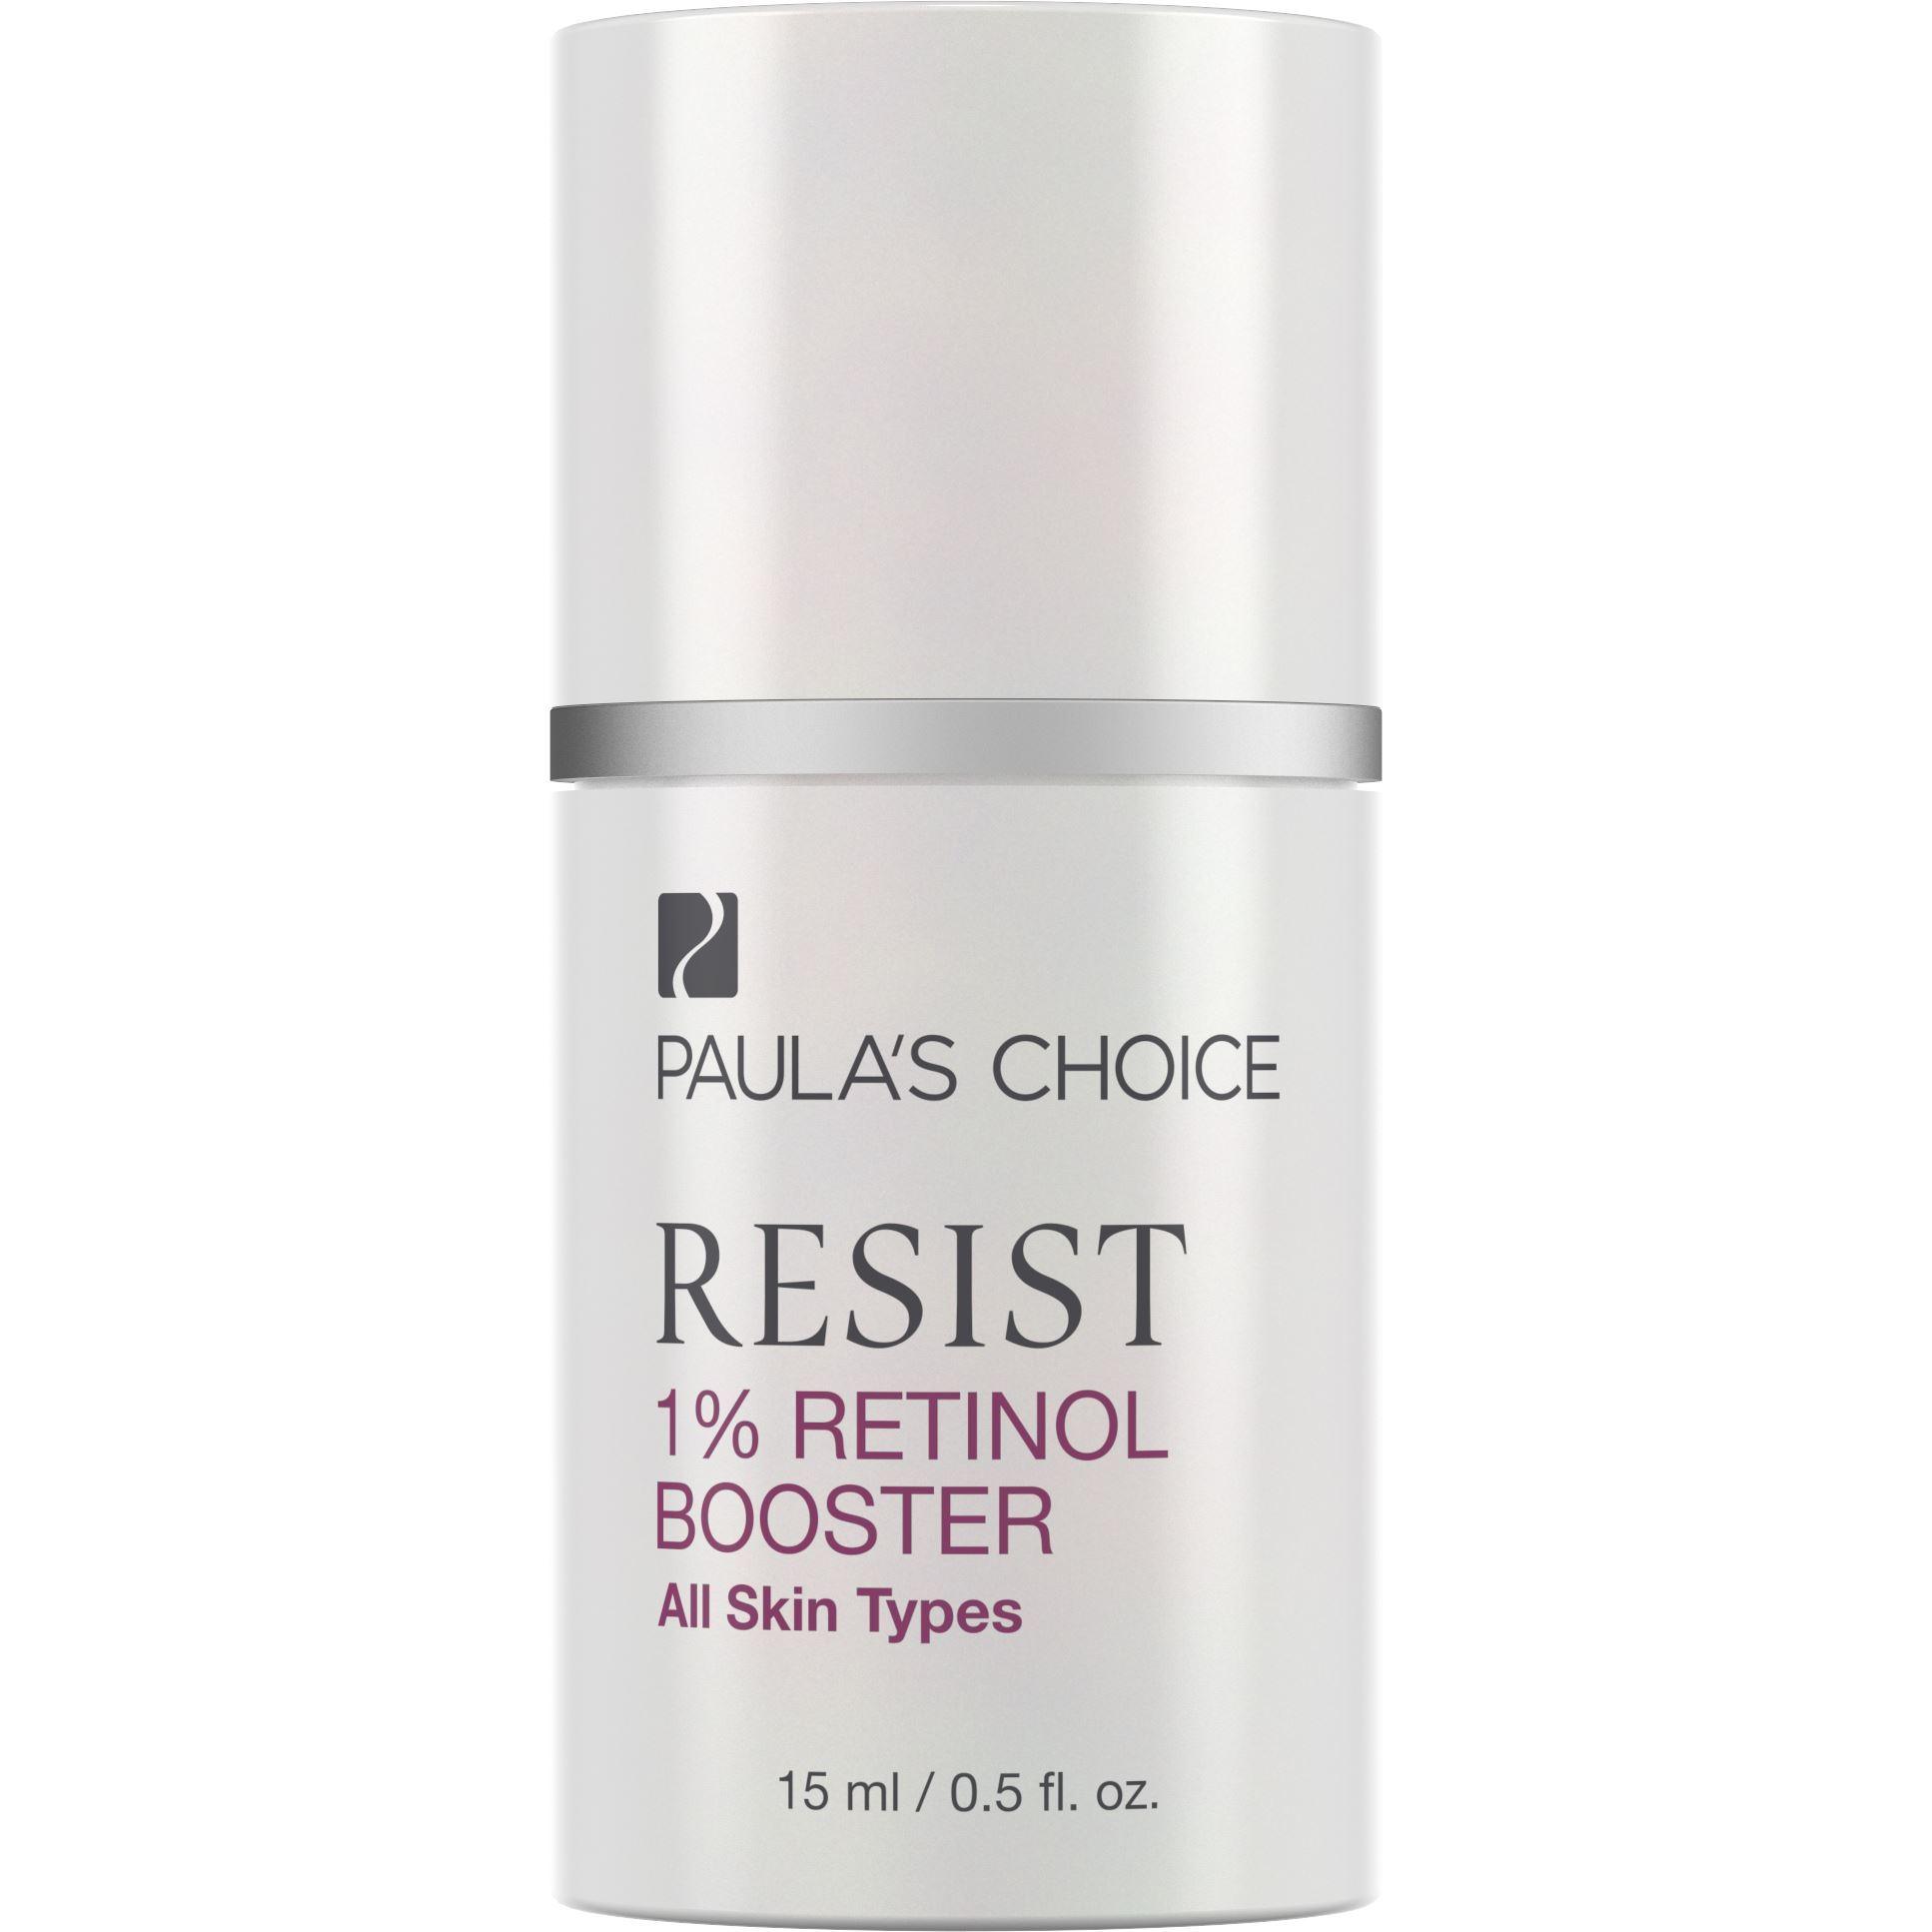 Paula's Choice Resist 1% Retinol Booster